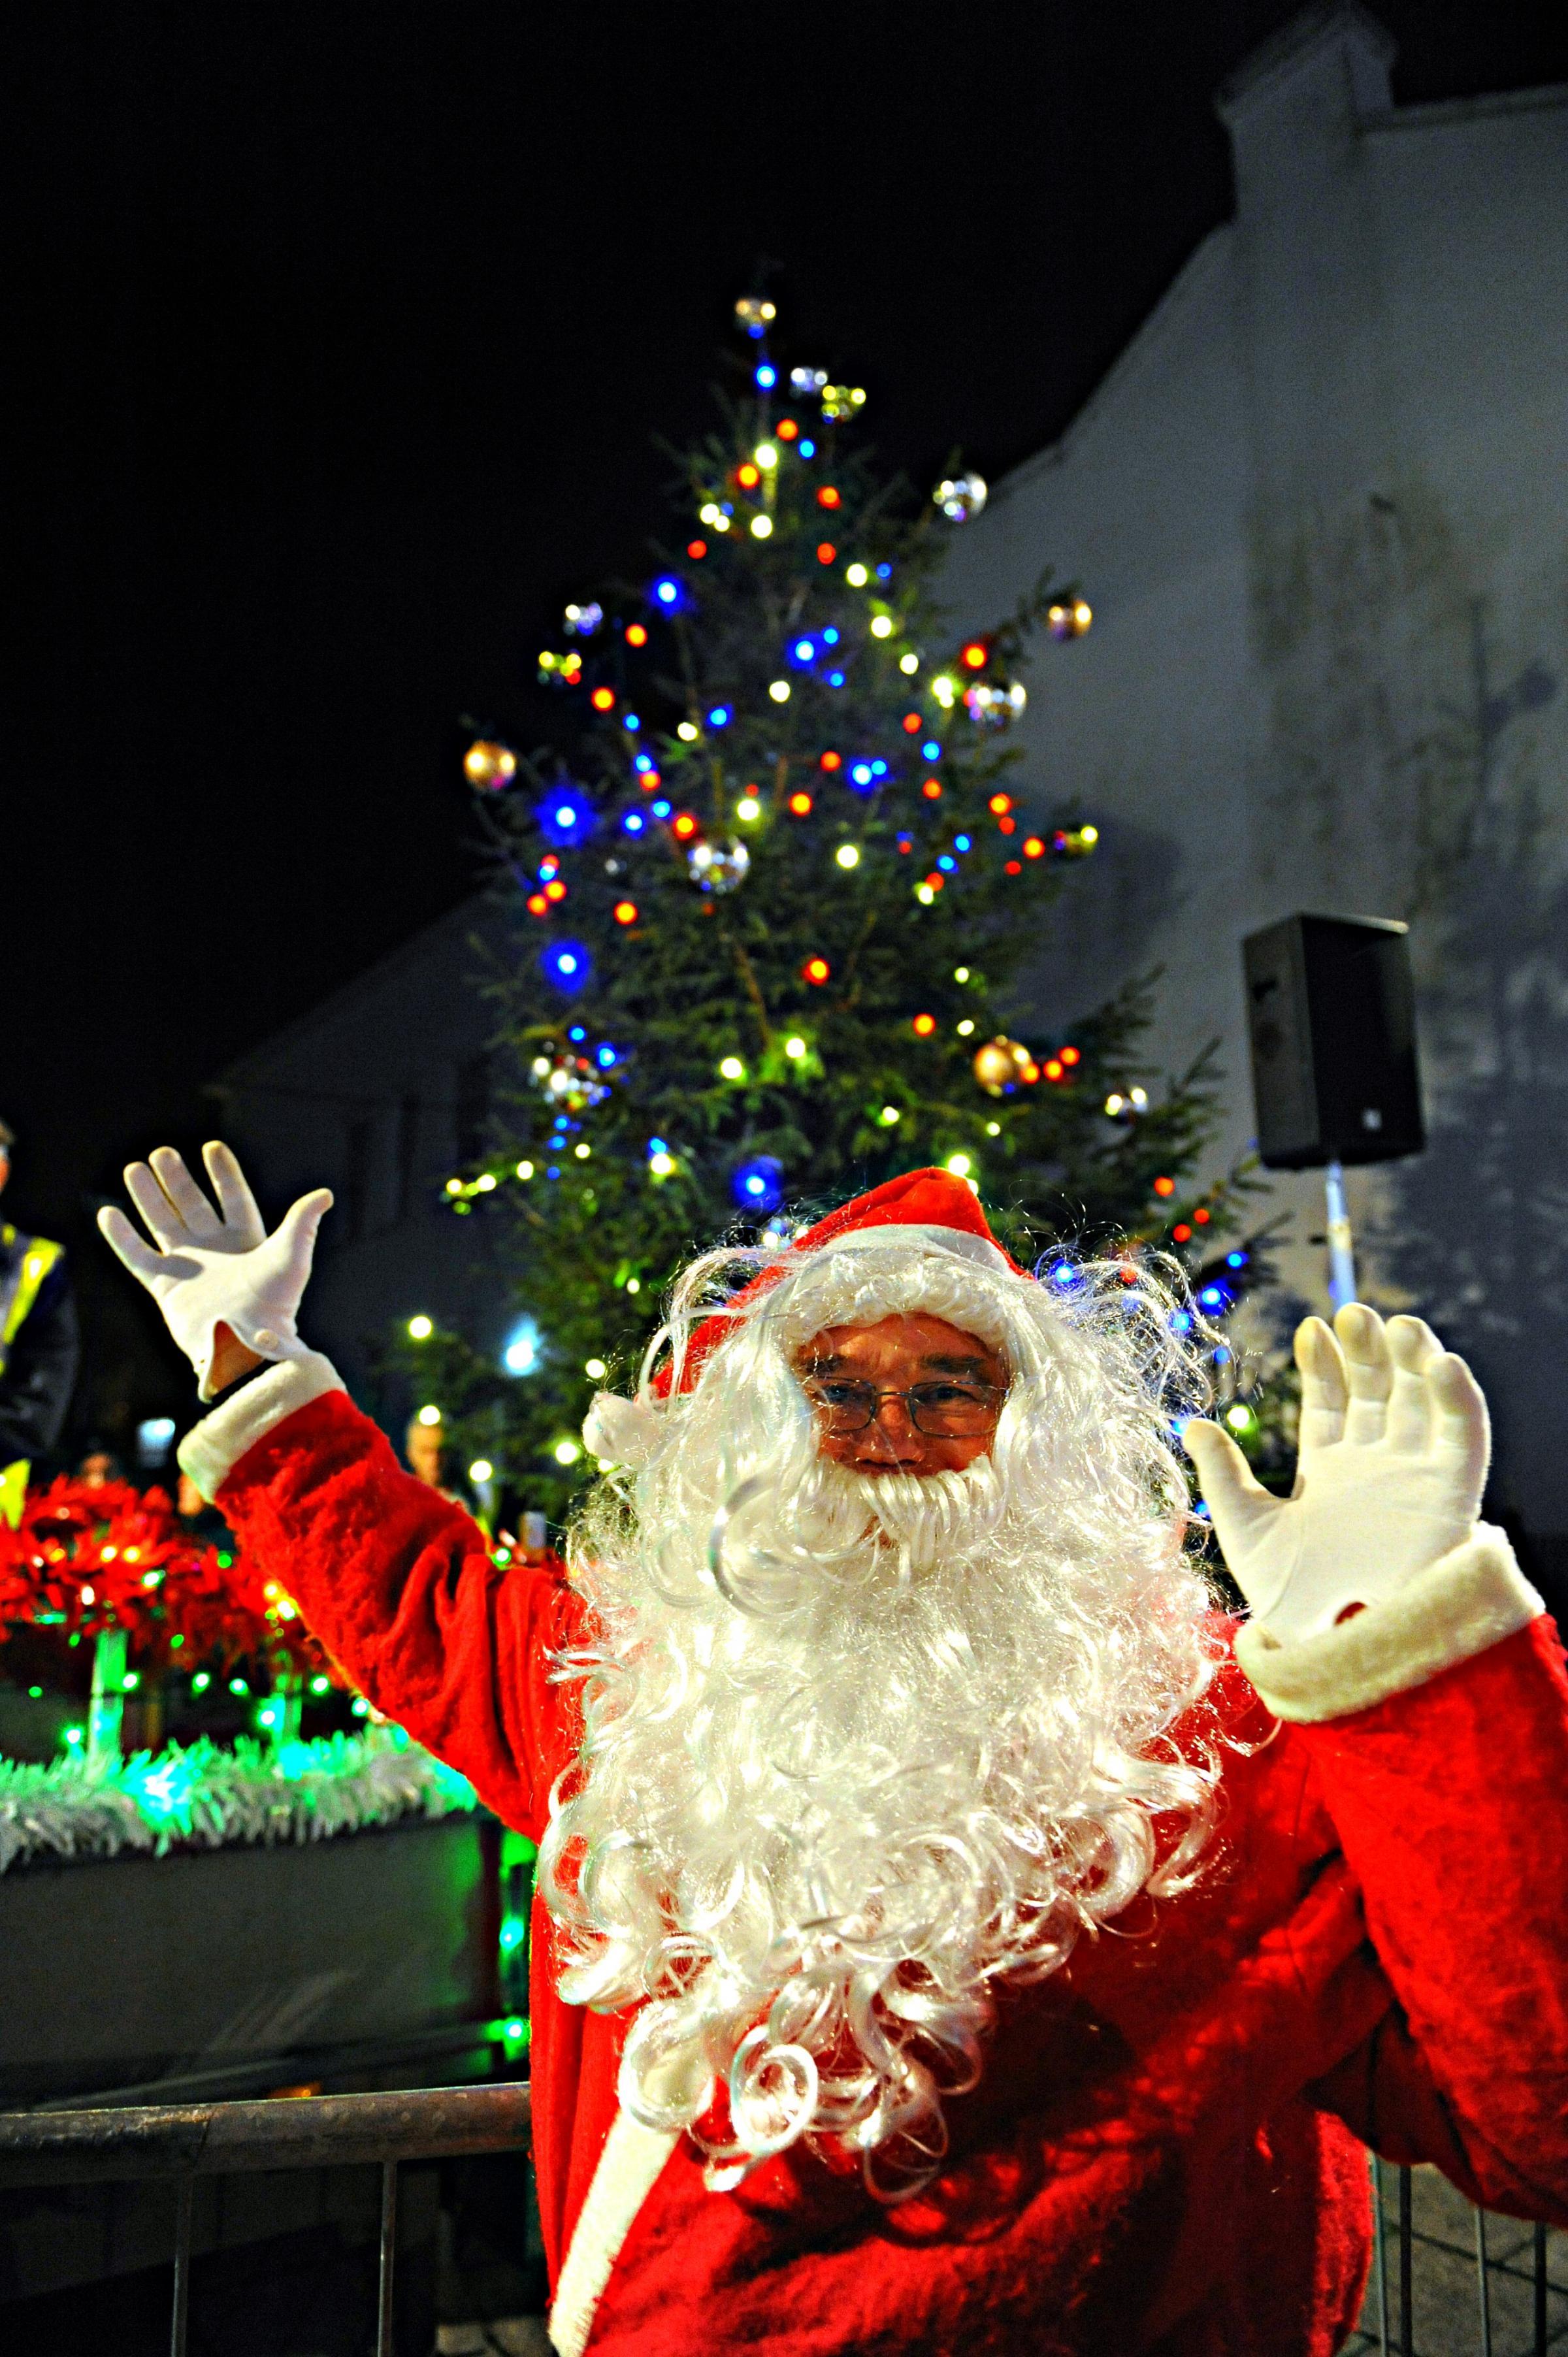 Thornbury Christmas Fair downsized but lights switch-on defiant ...